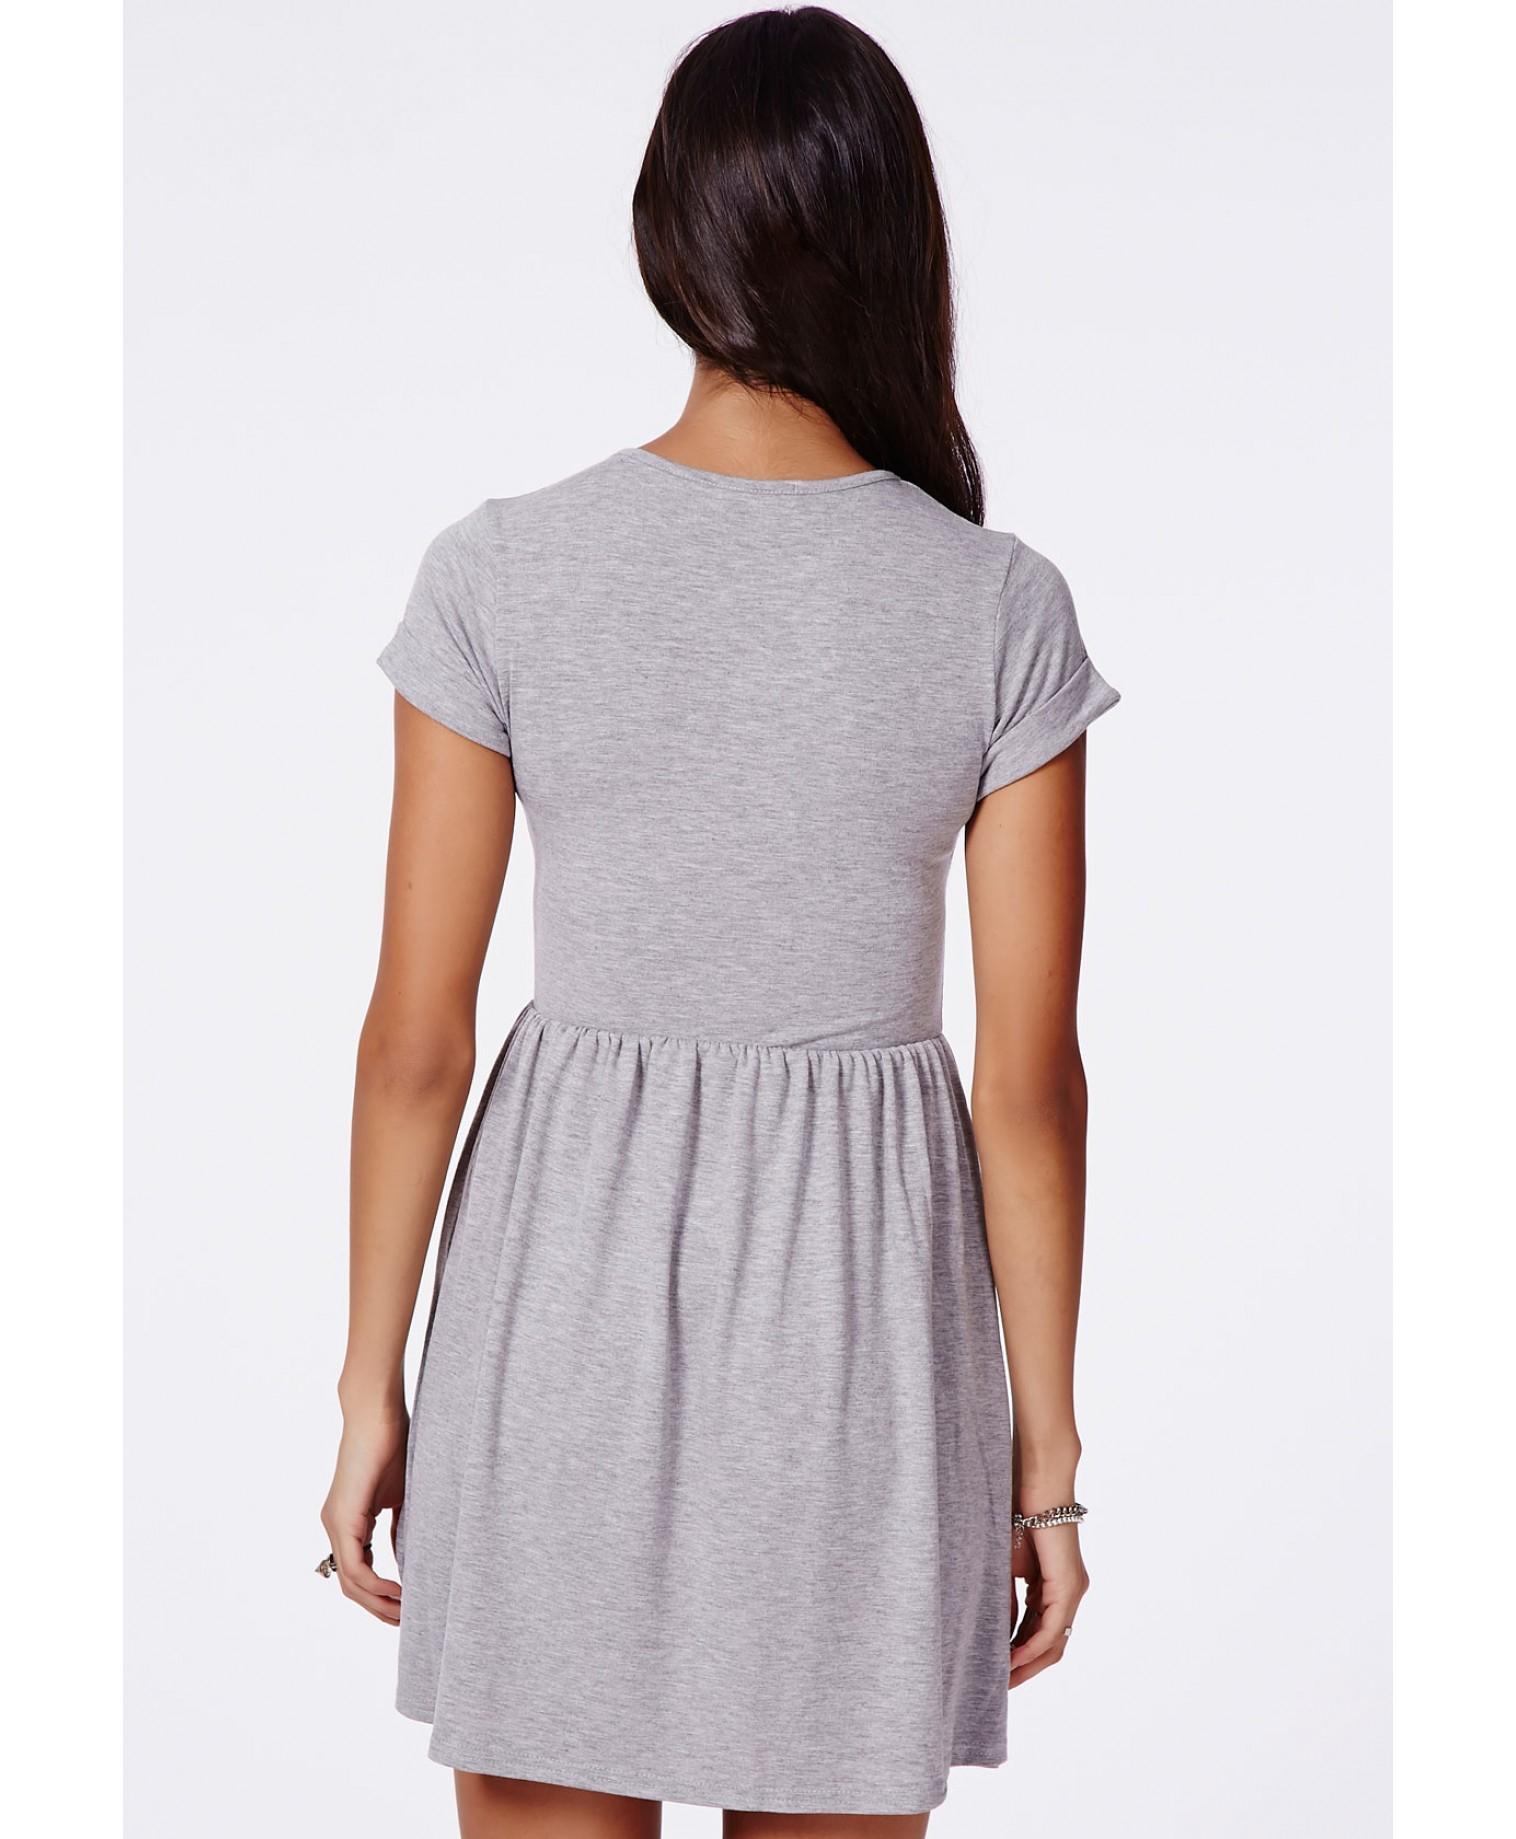 1e6b5128ca Missguided Aliveta T-Shirt Skater Dress in Gray - Lyst